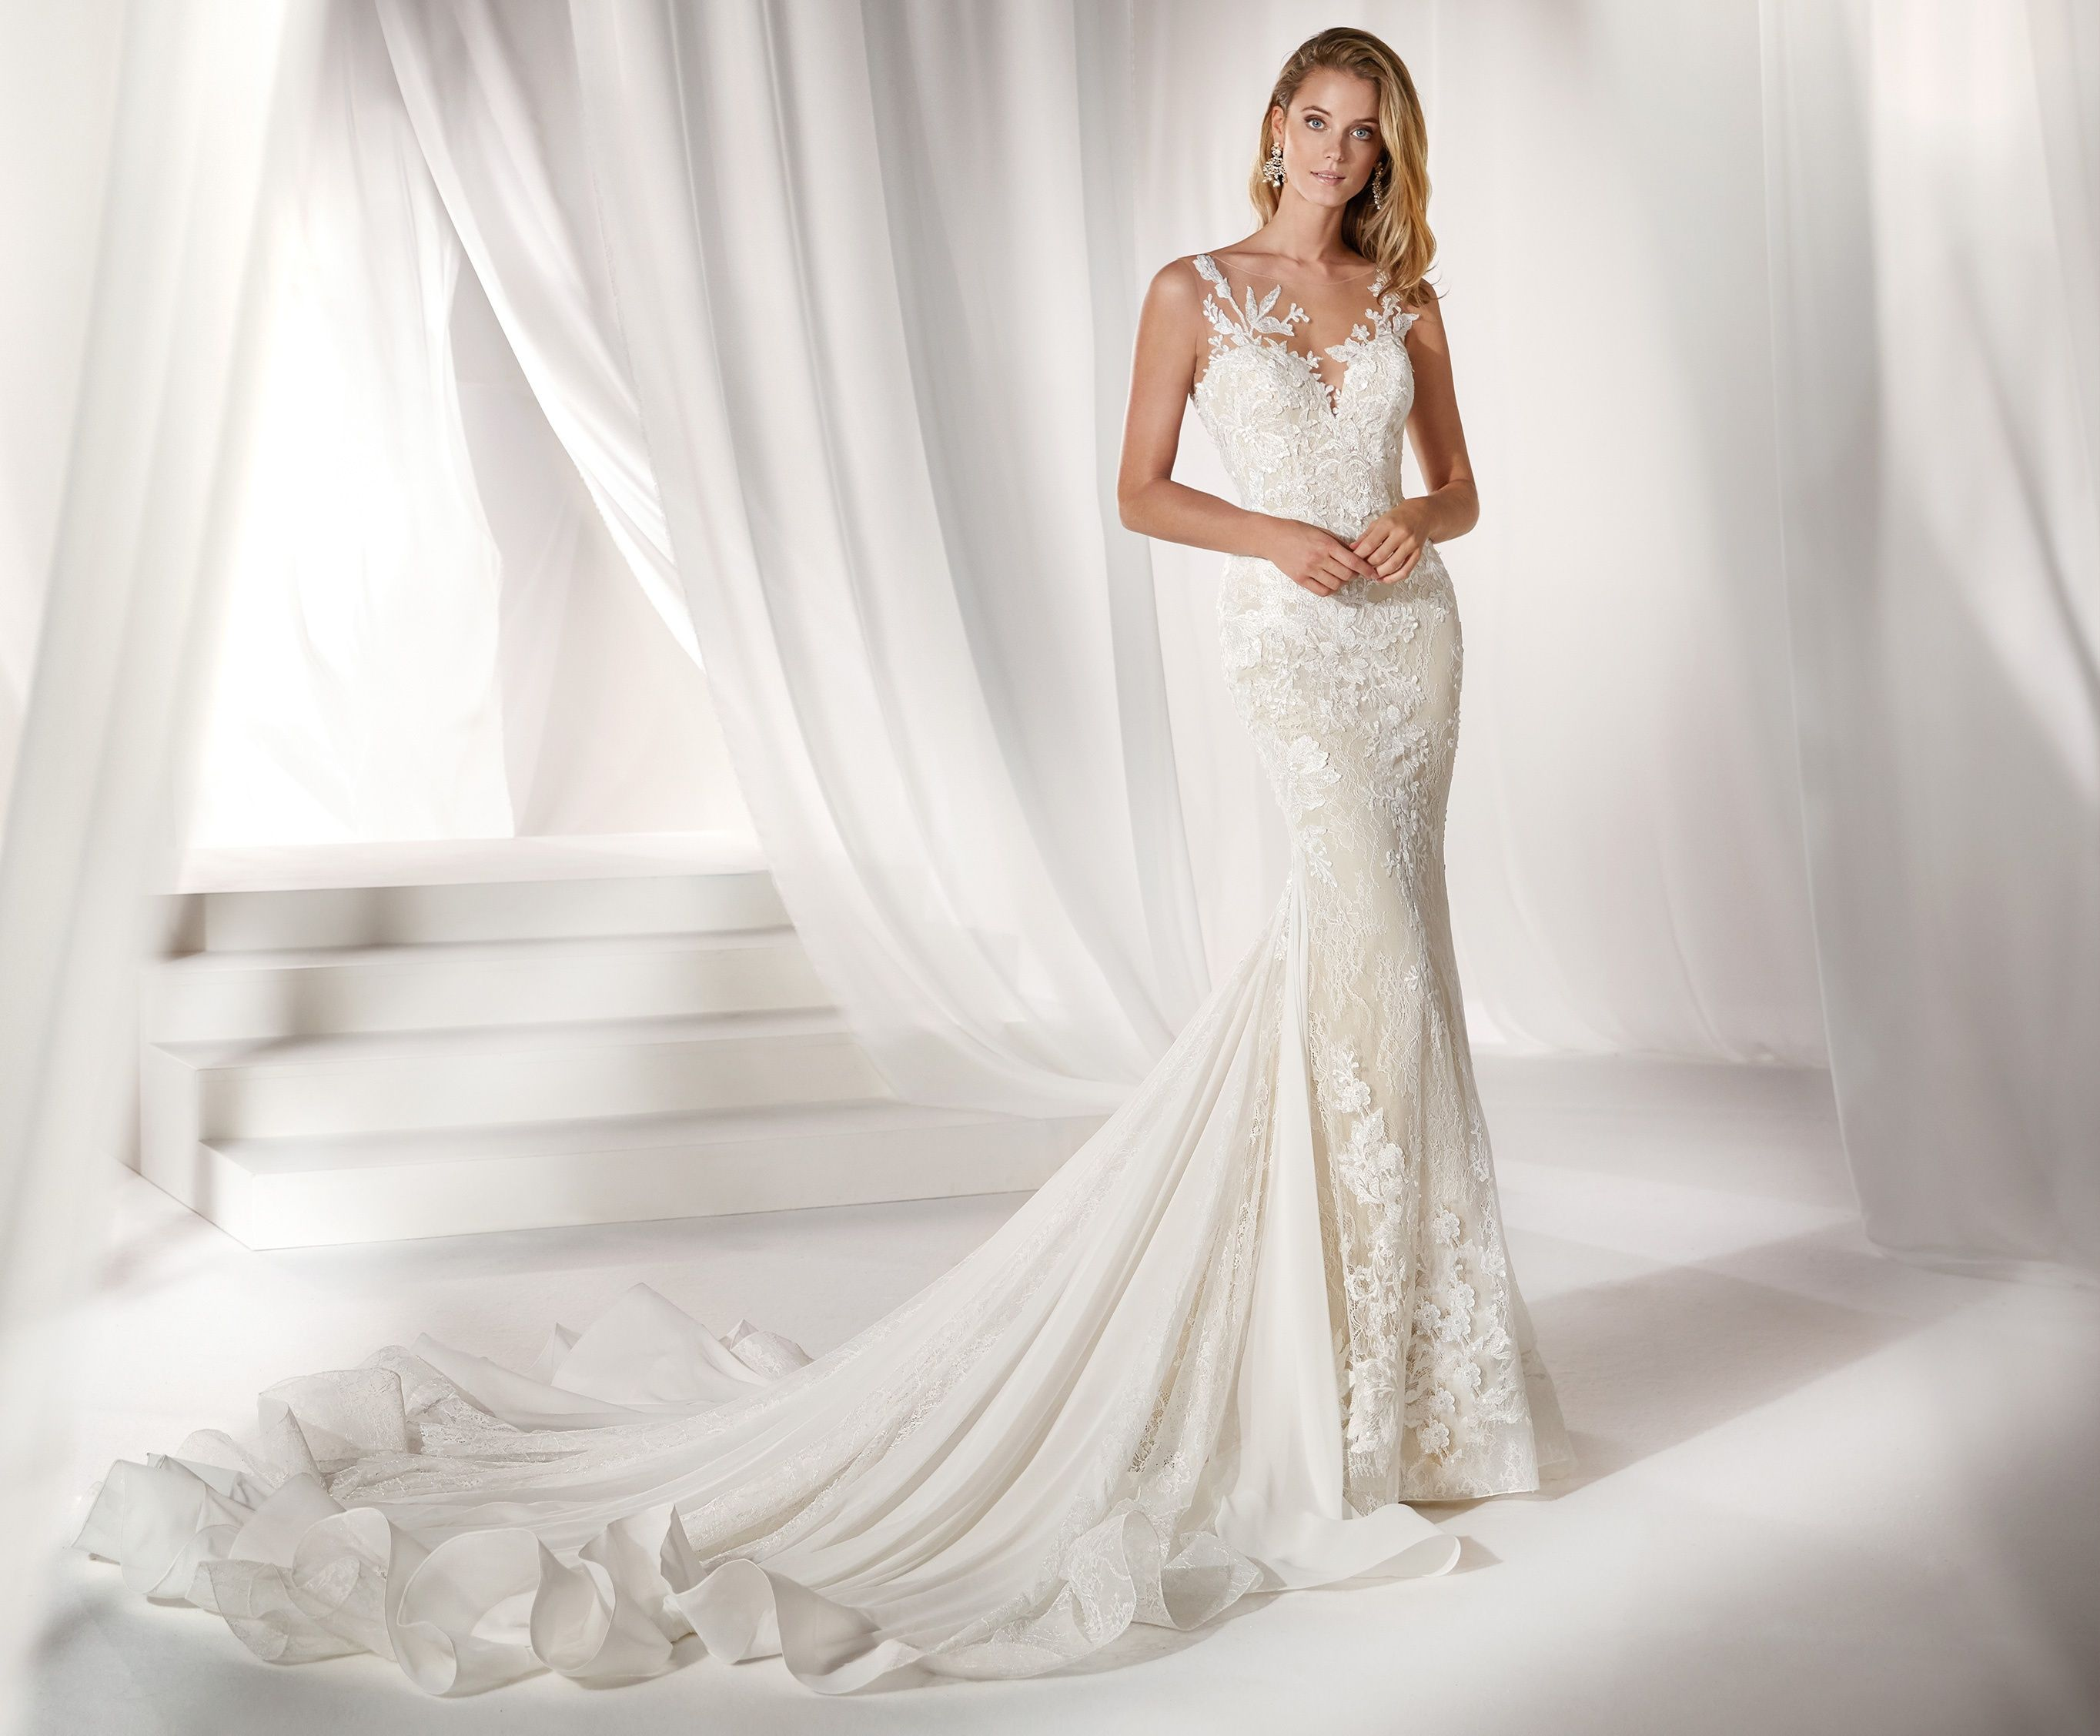 Moda Sposa 2019 Collezione Nicole Niab19040 Abito Da Sposa Nicole Wedding Dresses Italy Wedding Dress New Wedding Dresses